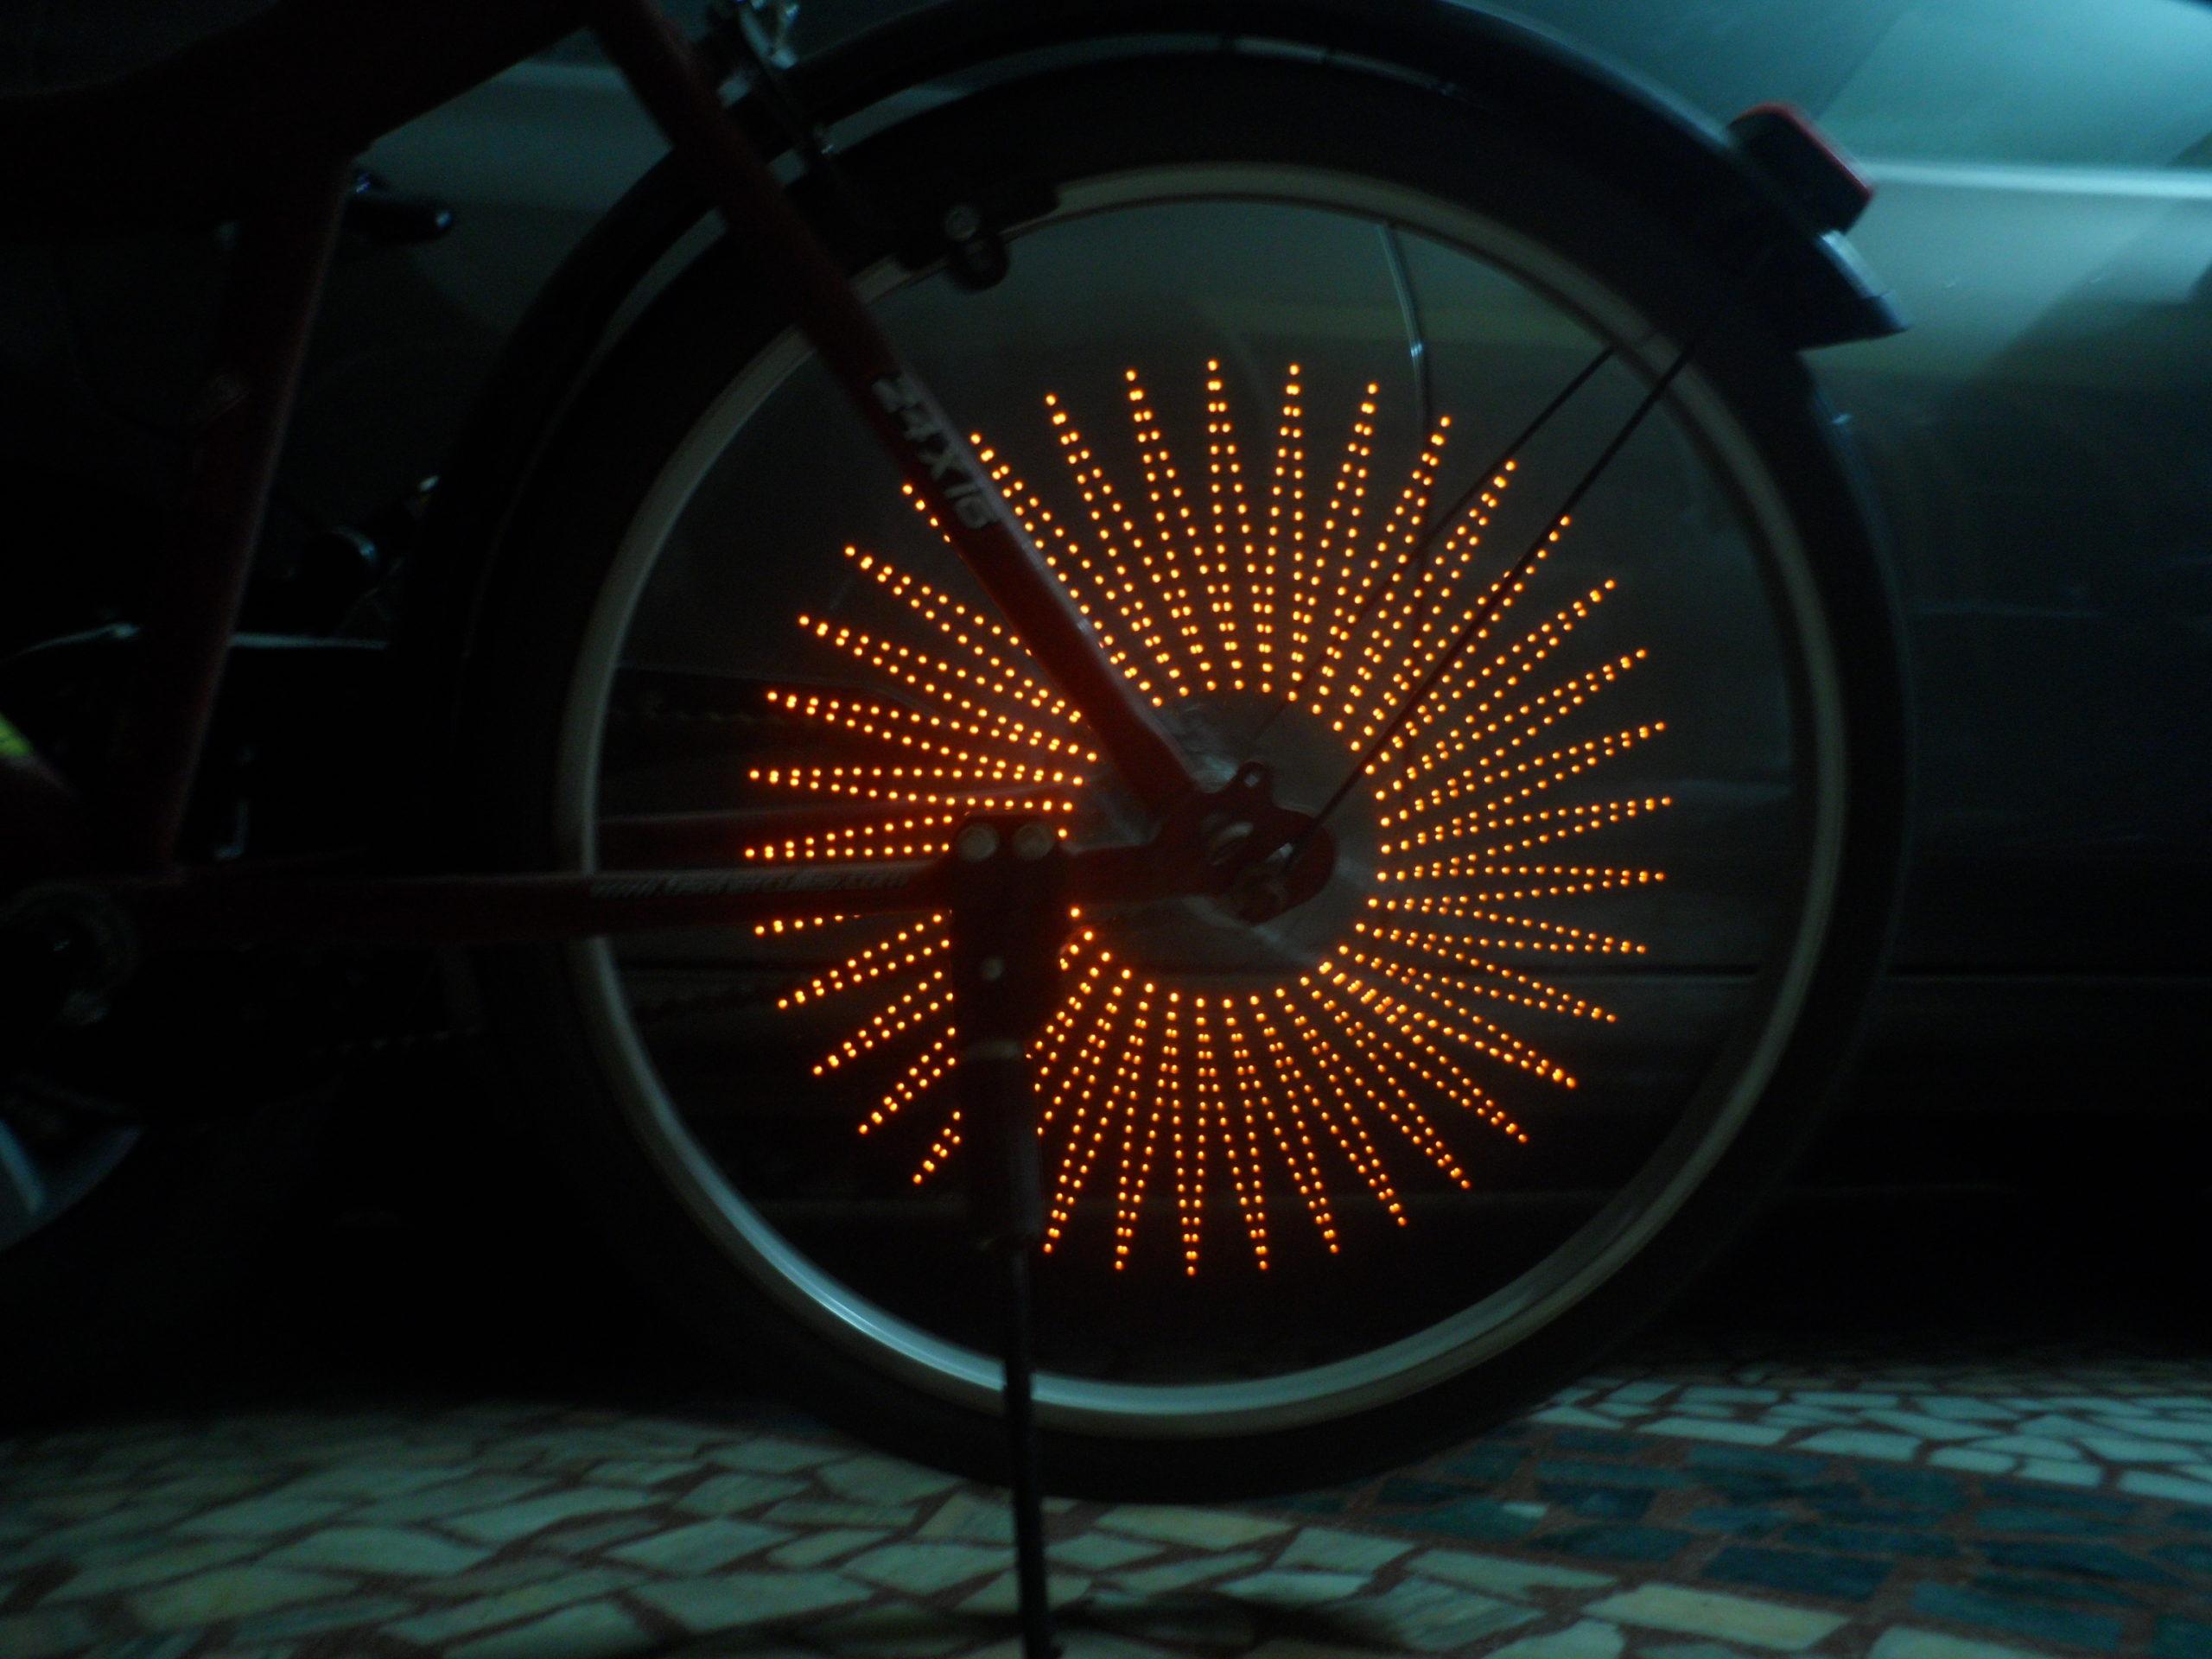 Cycle spoke POV wand